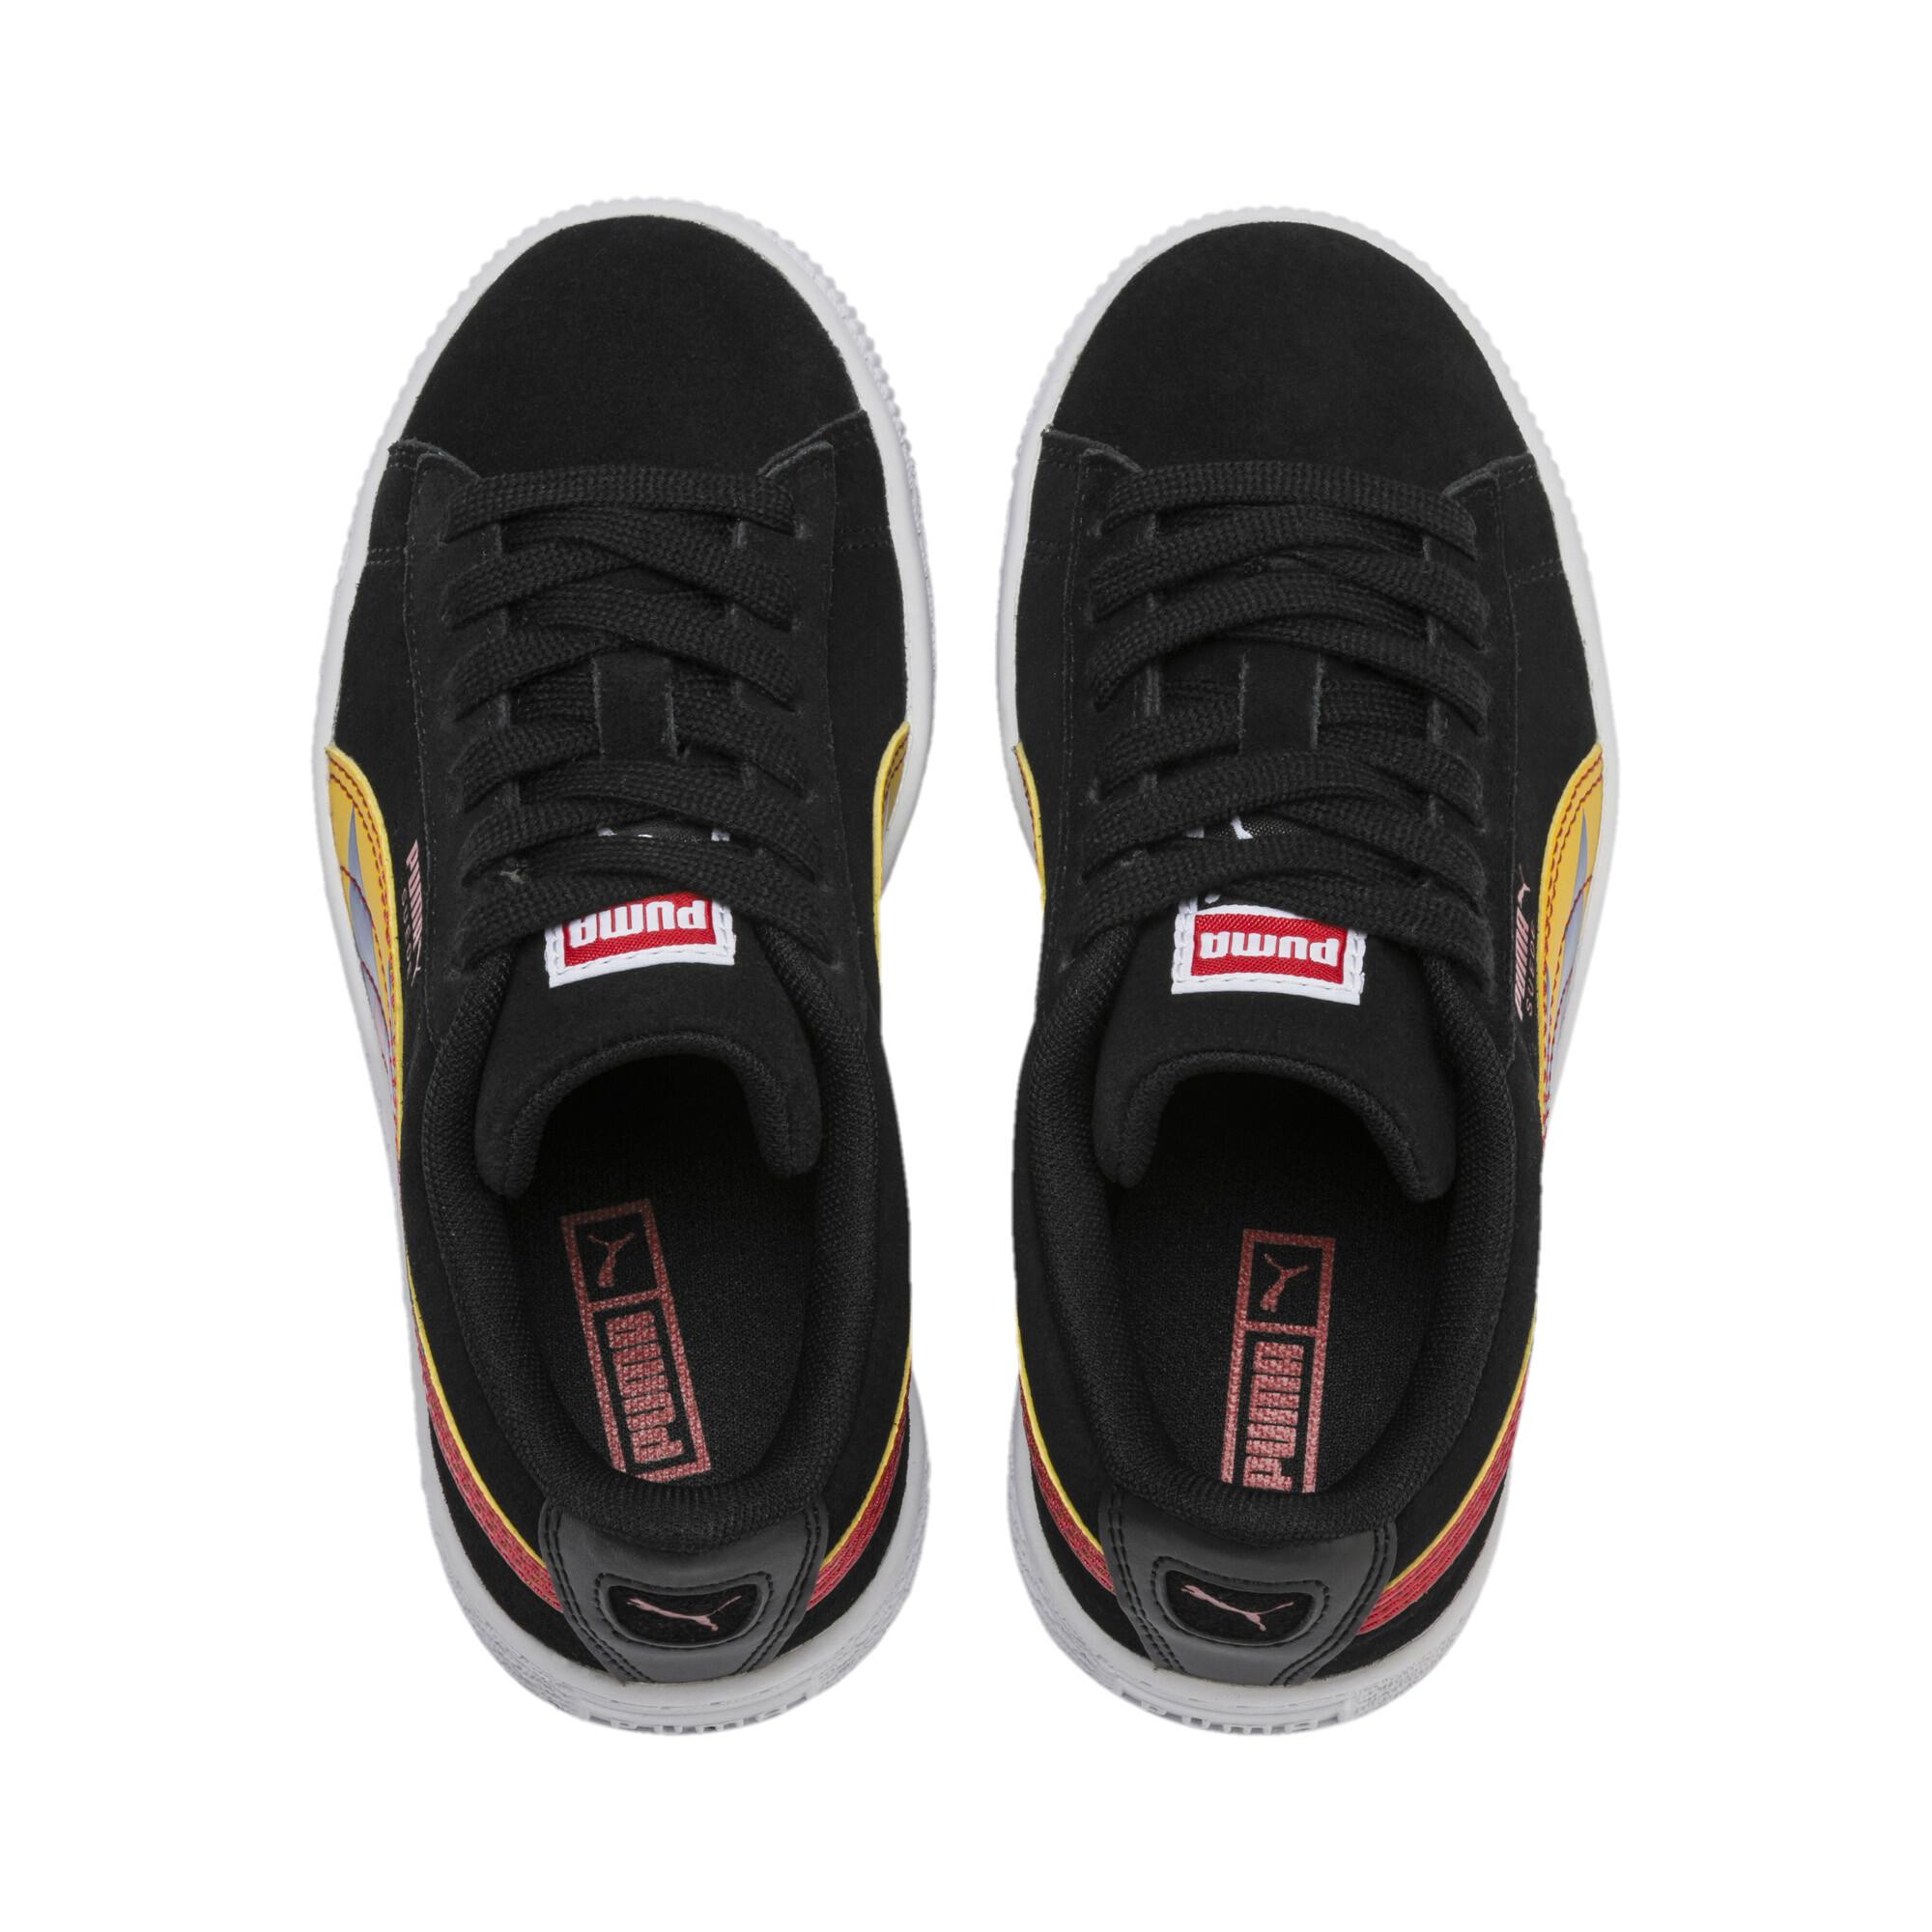 PUMA-Suede-Classic-Lightning-Little-Kids-039-Shoes-Boys-Shoe-Kids thumbnail 7